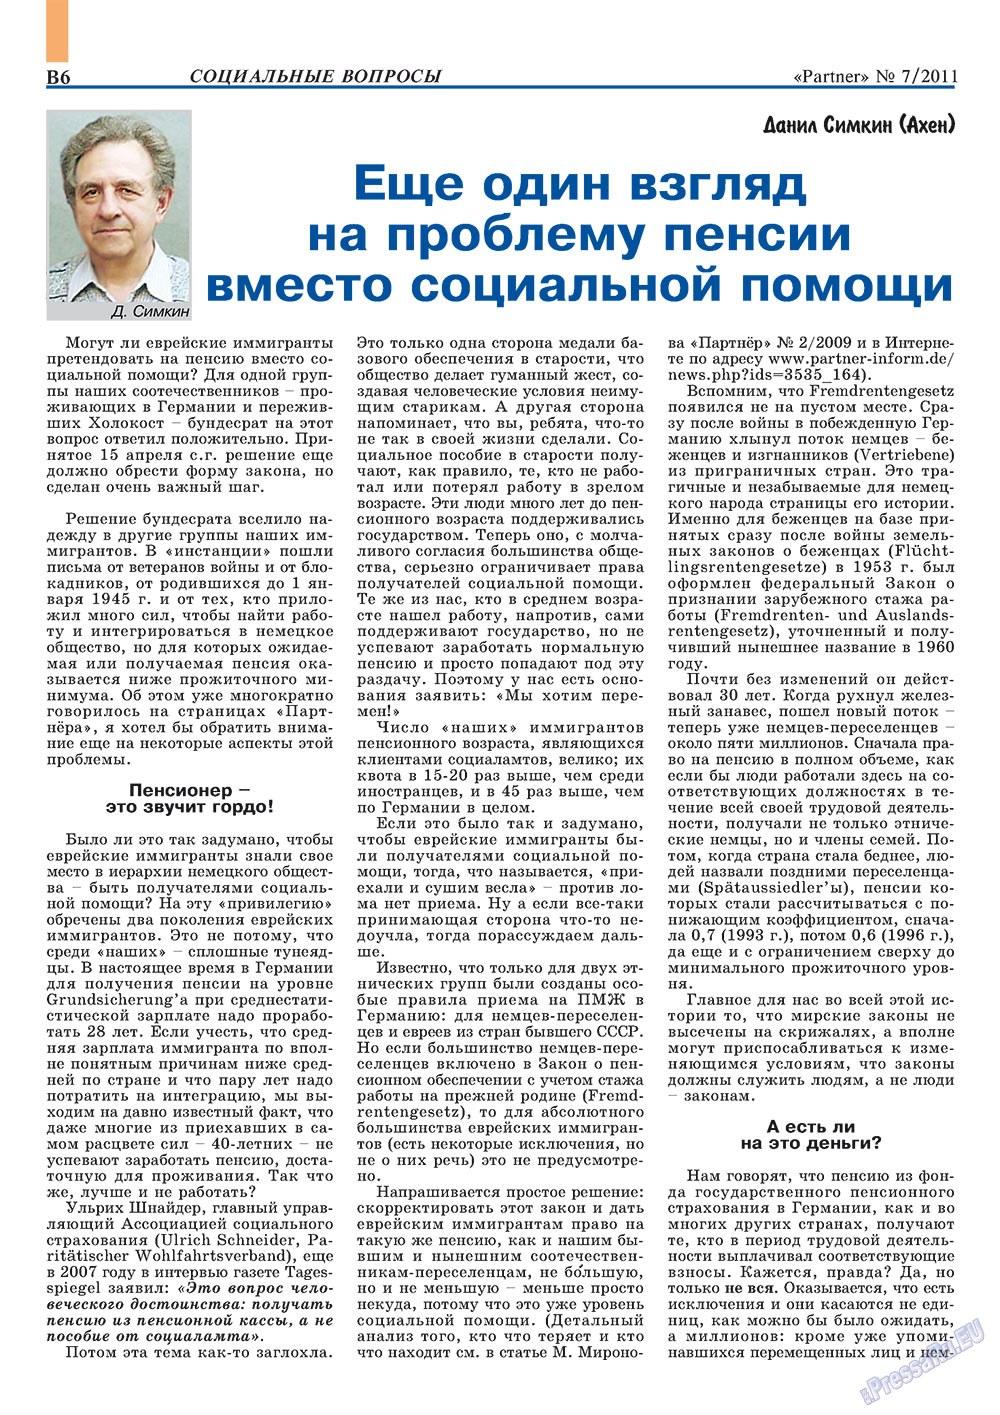 Партнер-север (журнал). 2011 год, номер 7, стр. 16